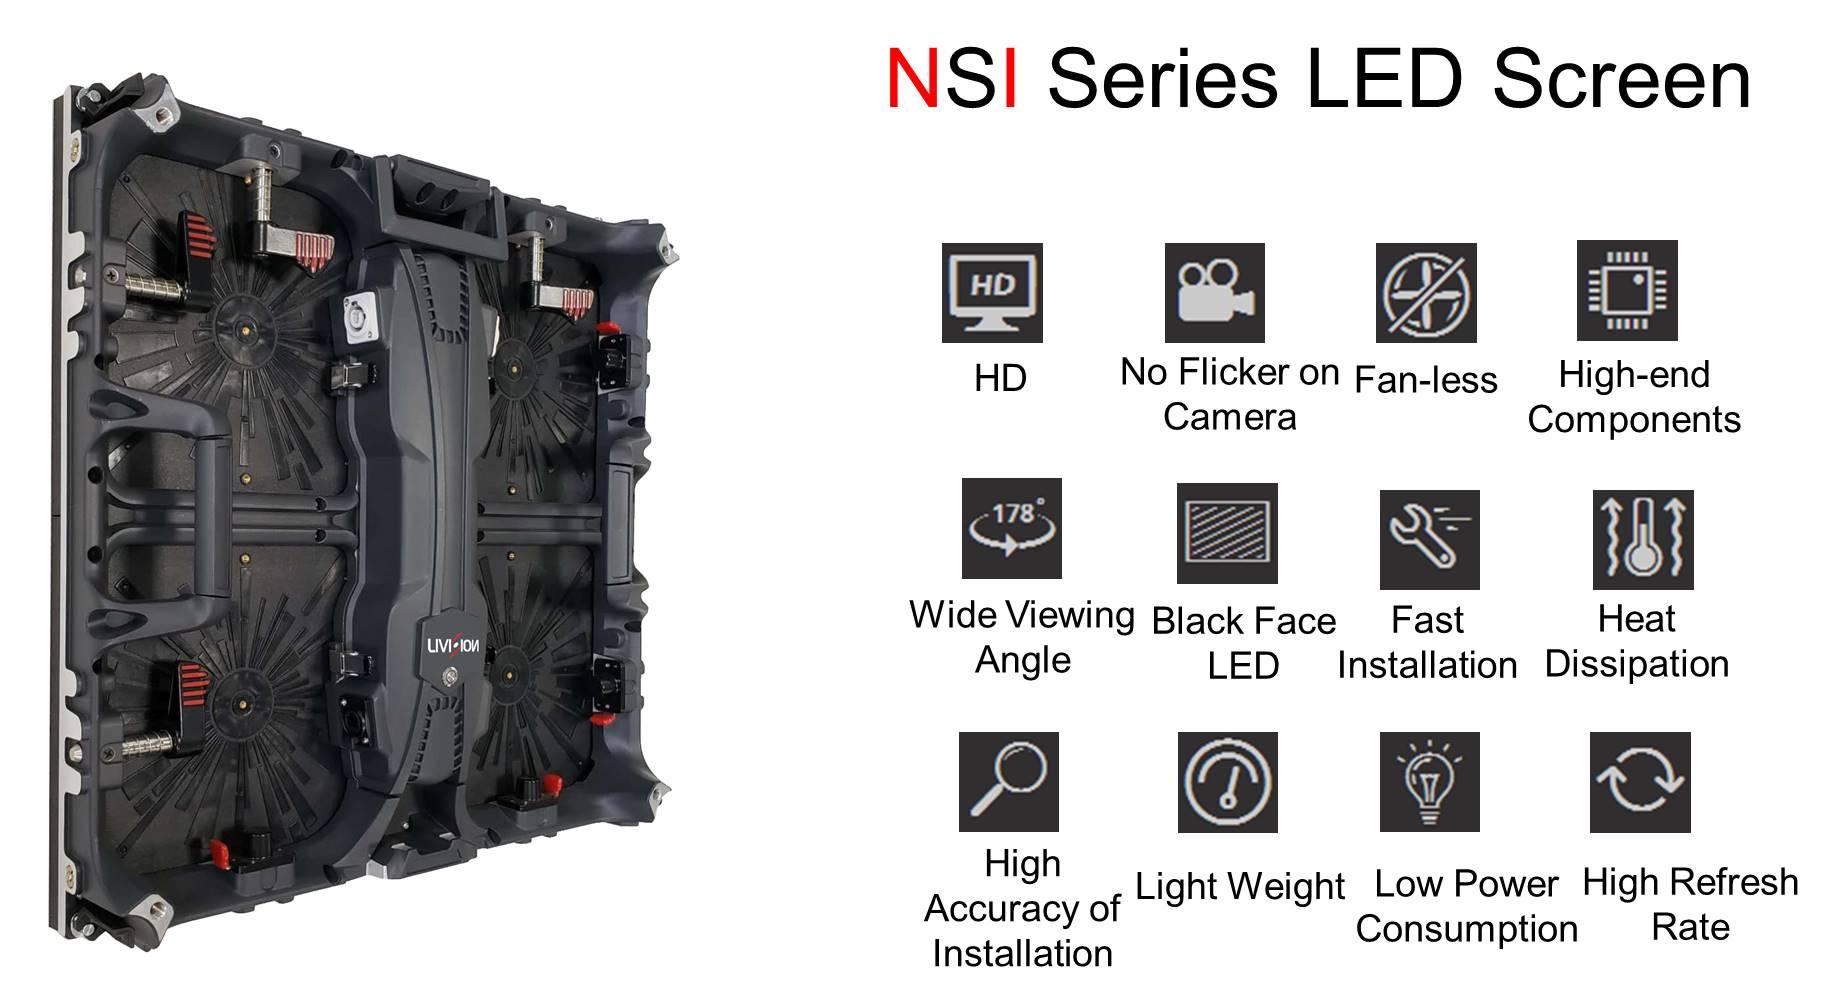 NSI Series Indoor LED Screens